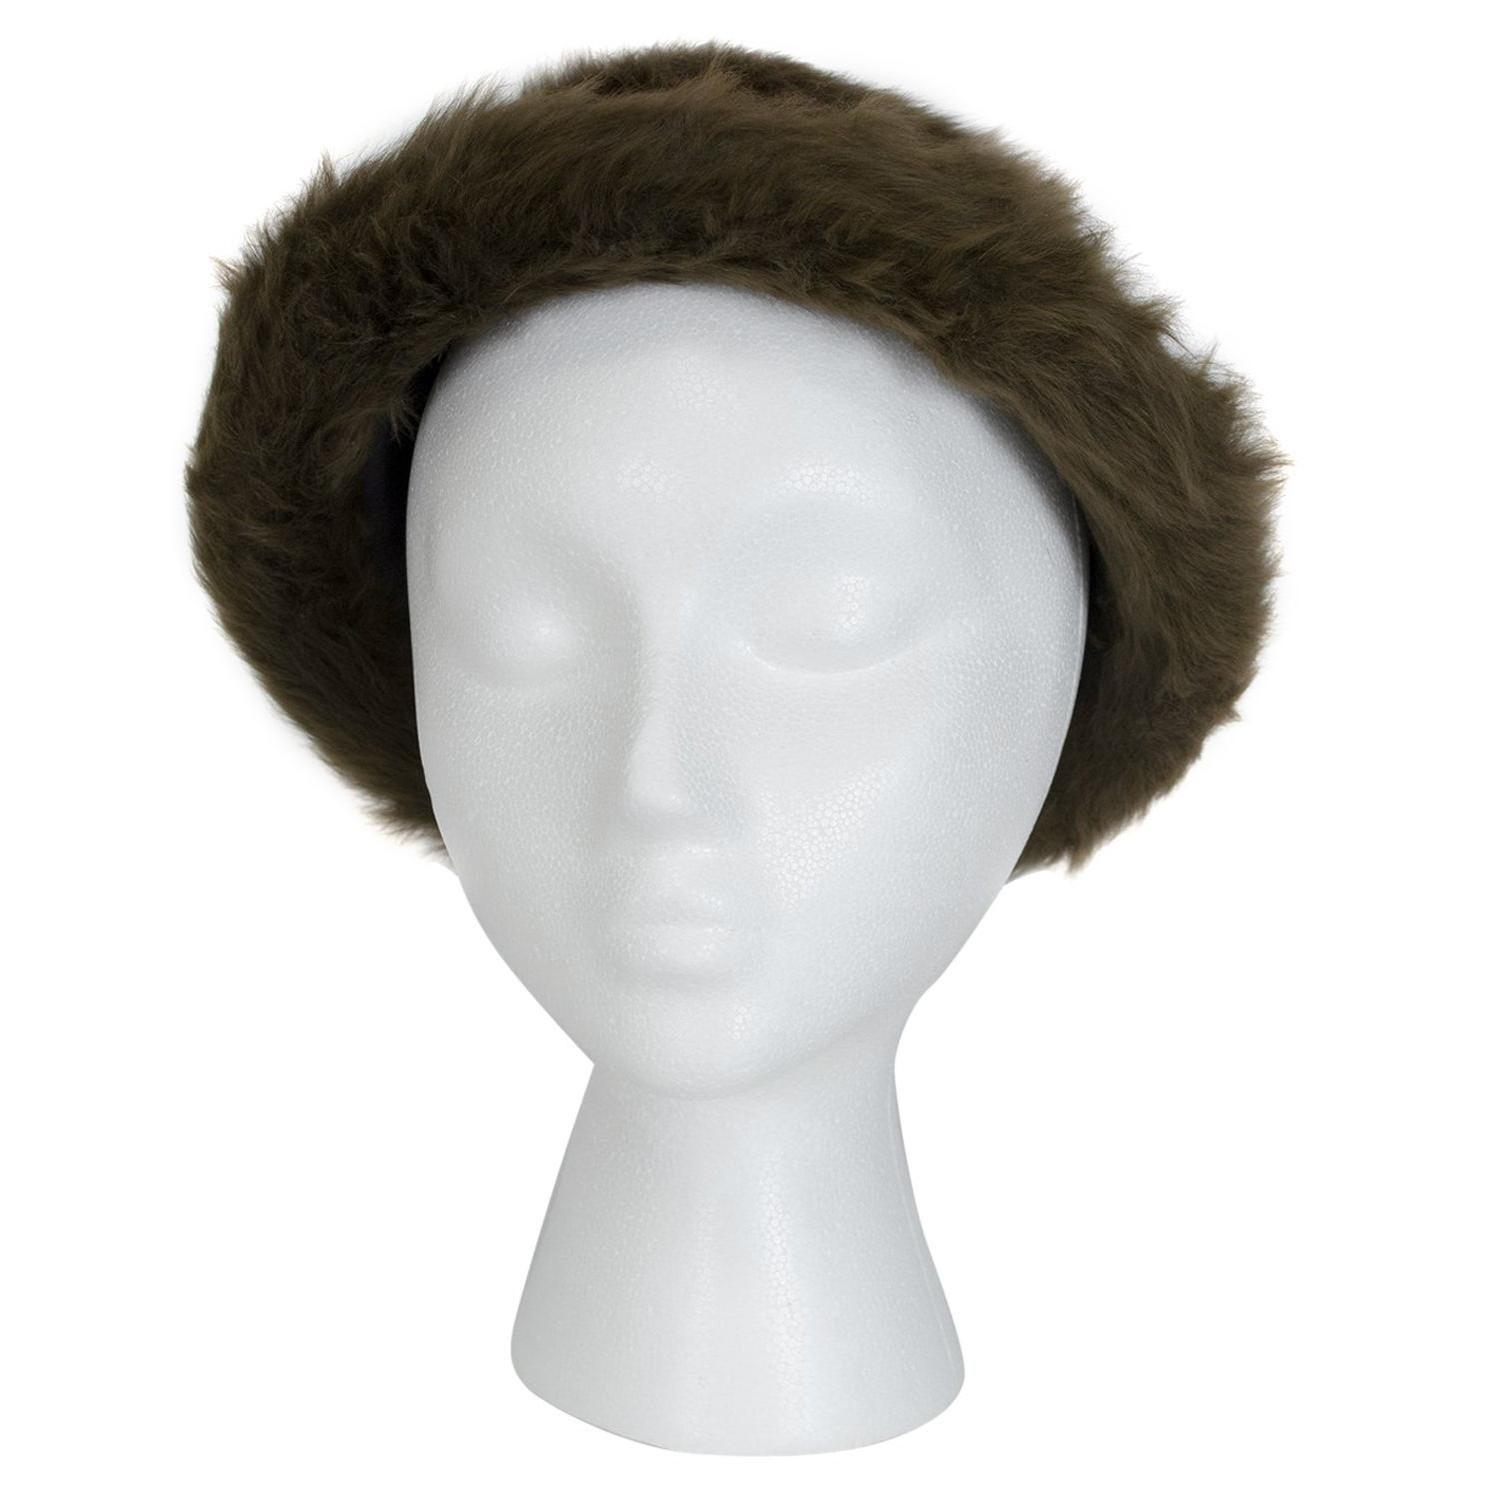 "James Galanos Soft Brown Toscana Shearling Fur Bowler Bucket Hat - 21"", 1980s"